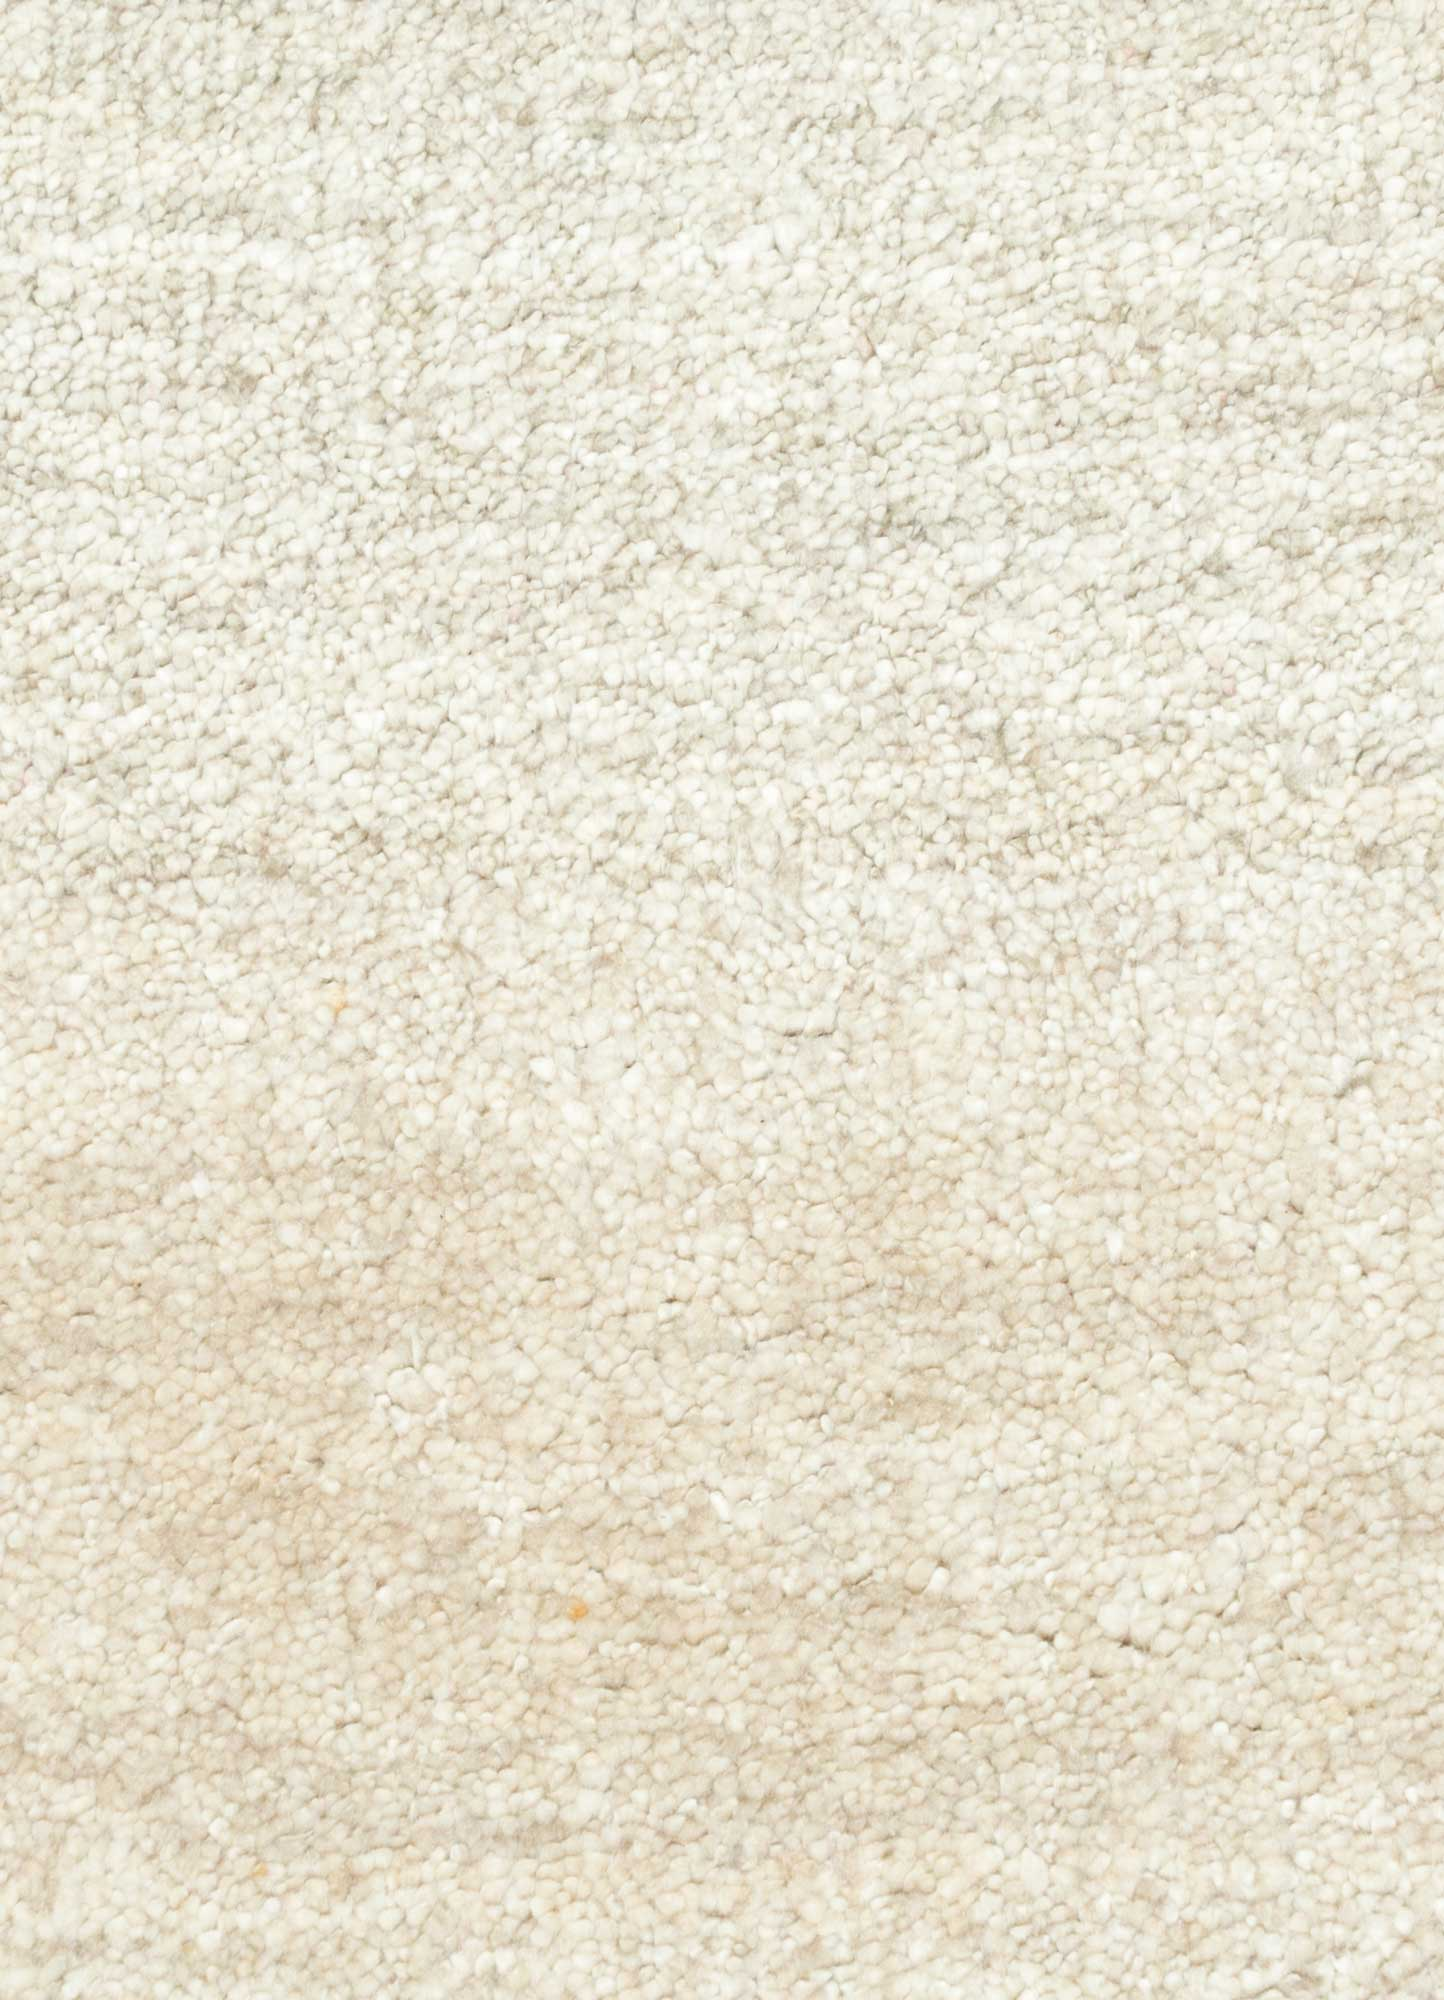 tesoro ivory viscose hand loom Rug - CloseUp